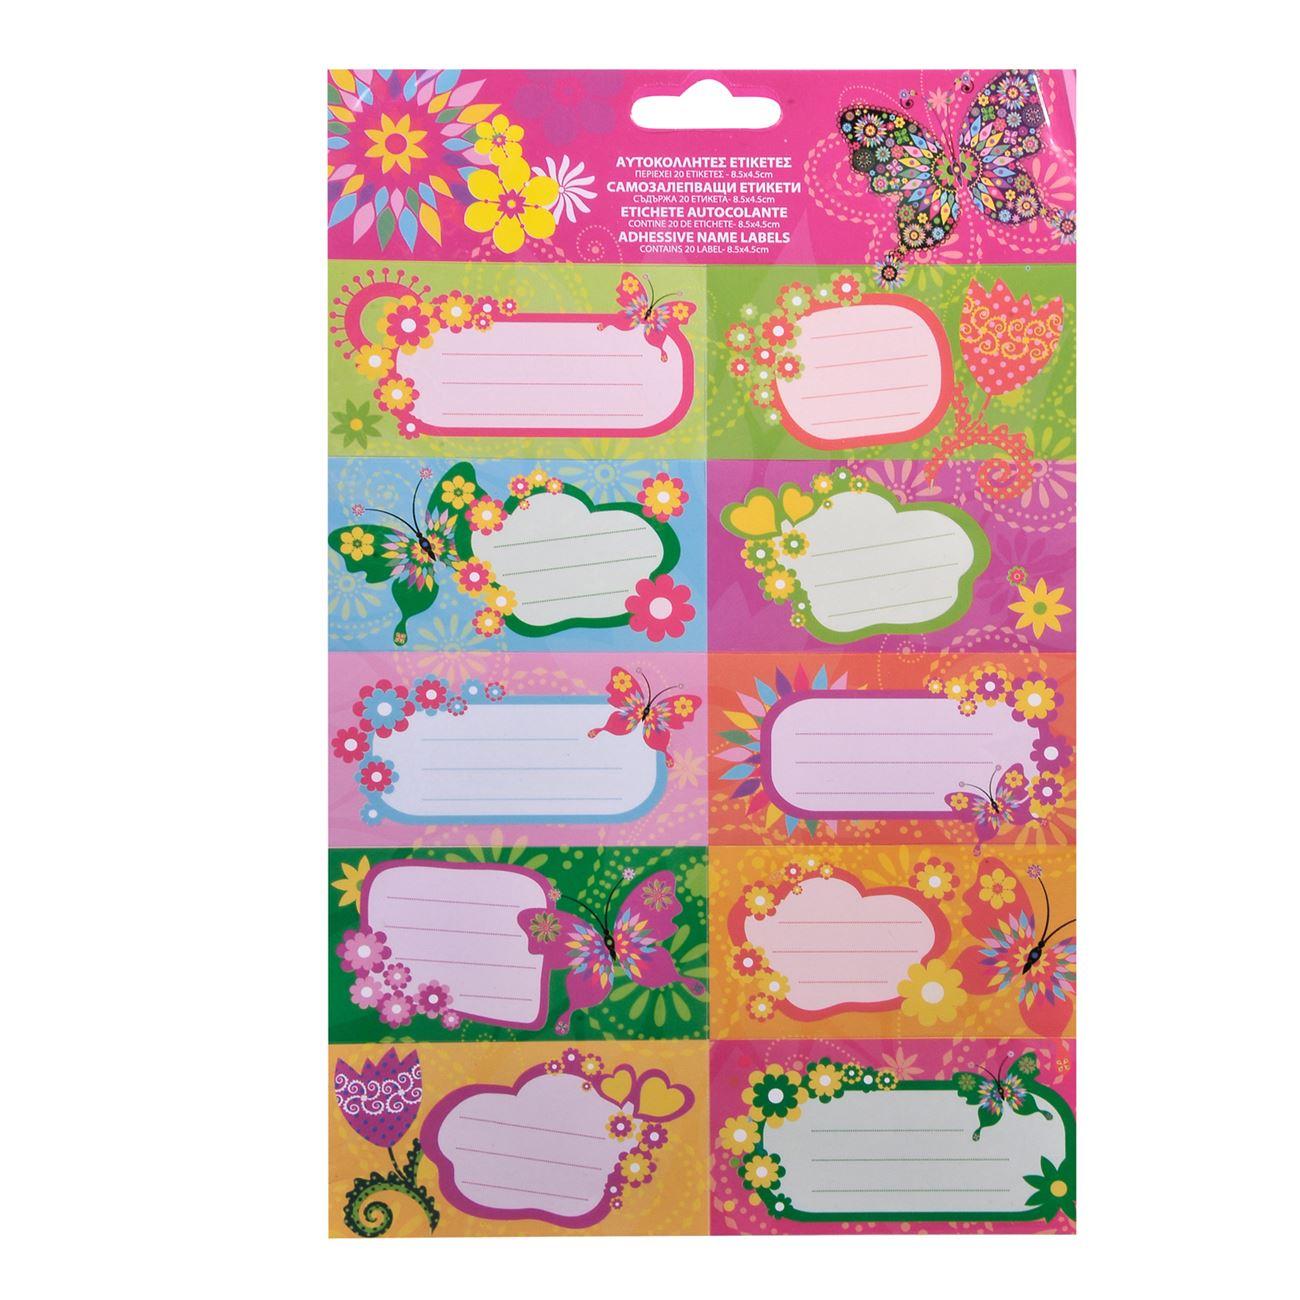 3d18cd8044 Αυτοκόλλητες Ετικέτες Λουλούδια - 20 τμχ.   Ετικέτες Κορίτσι